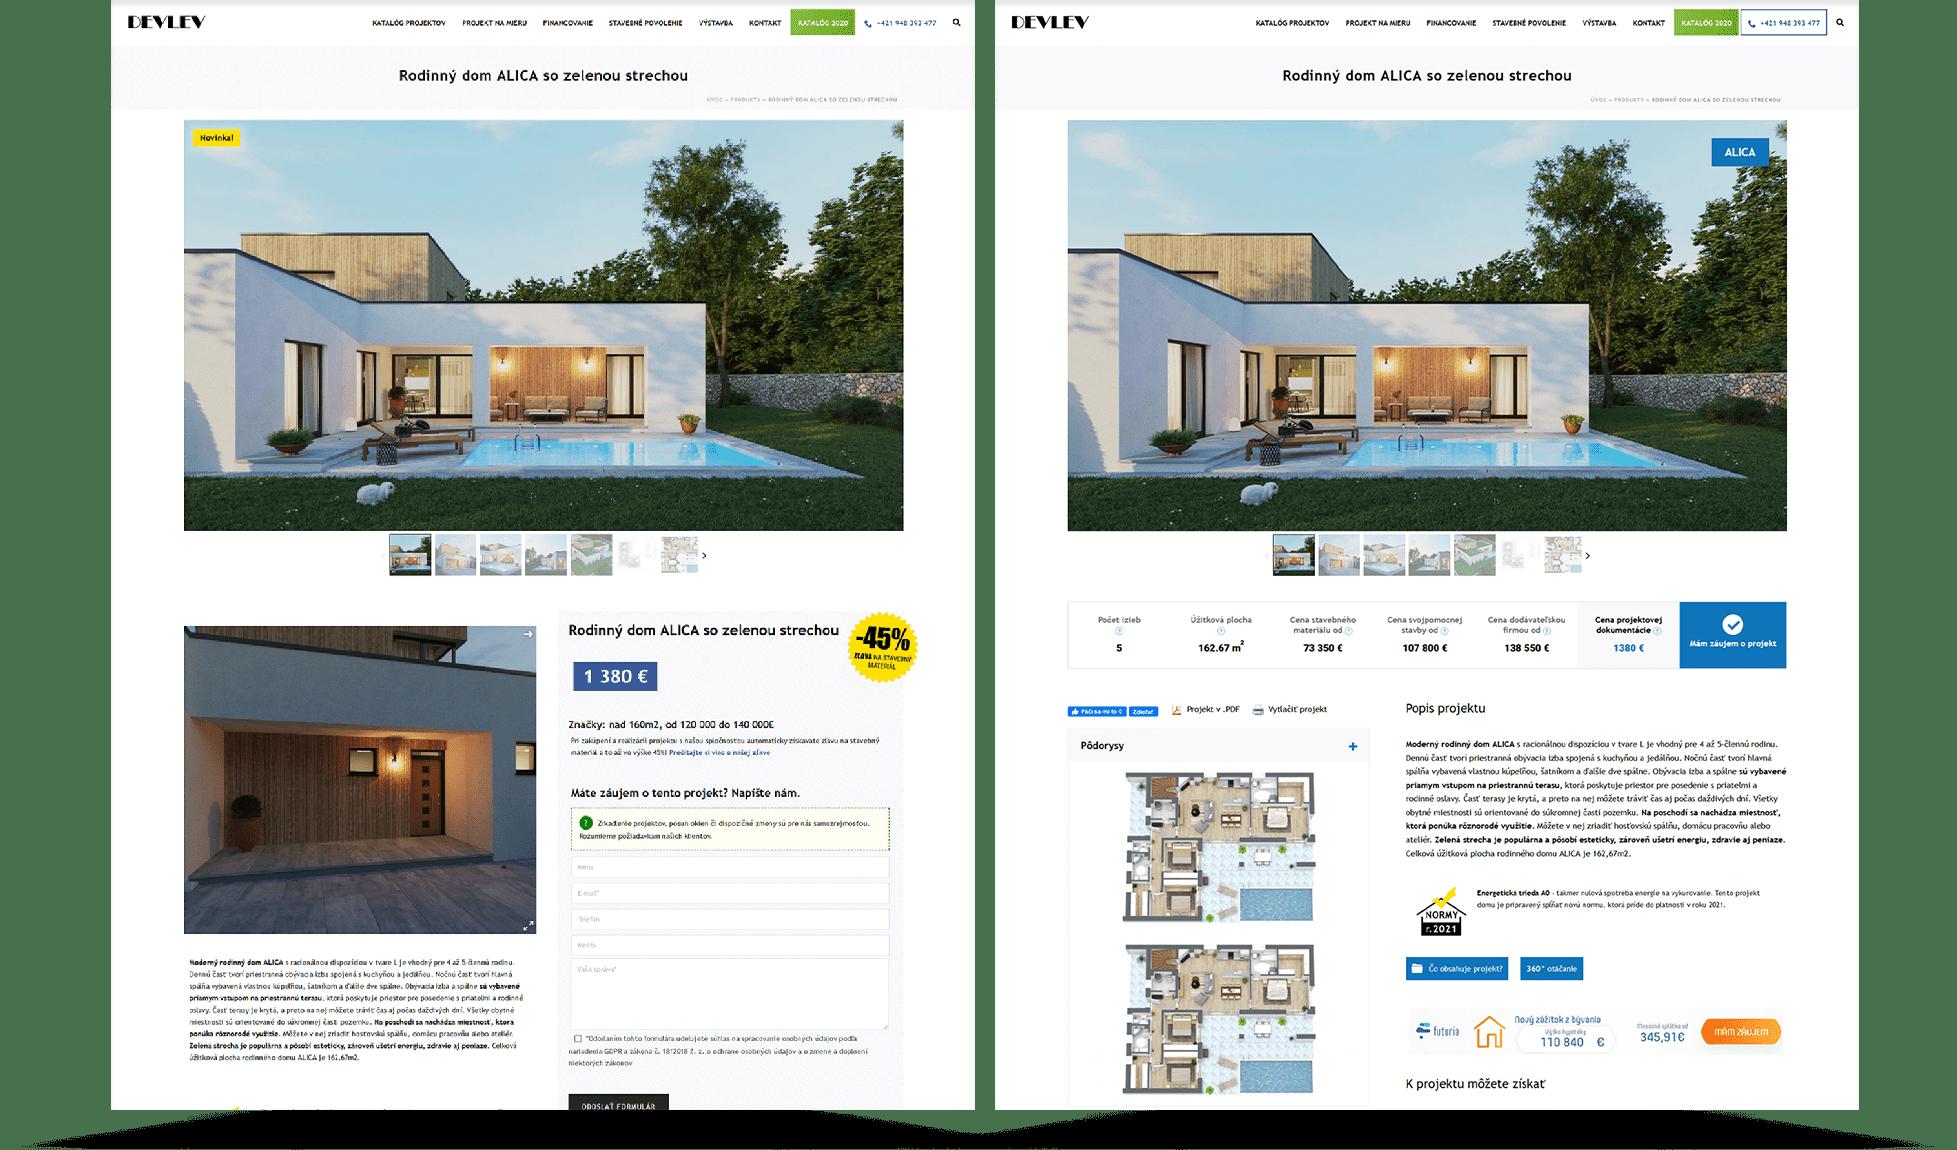 Tvorba eshopu katalogoveprojekty.sk | Marketingová agentúra UNIQINO